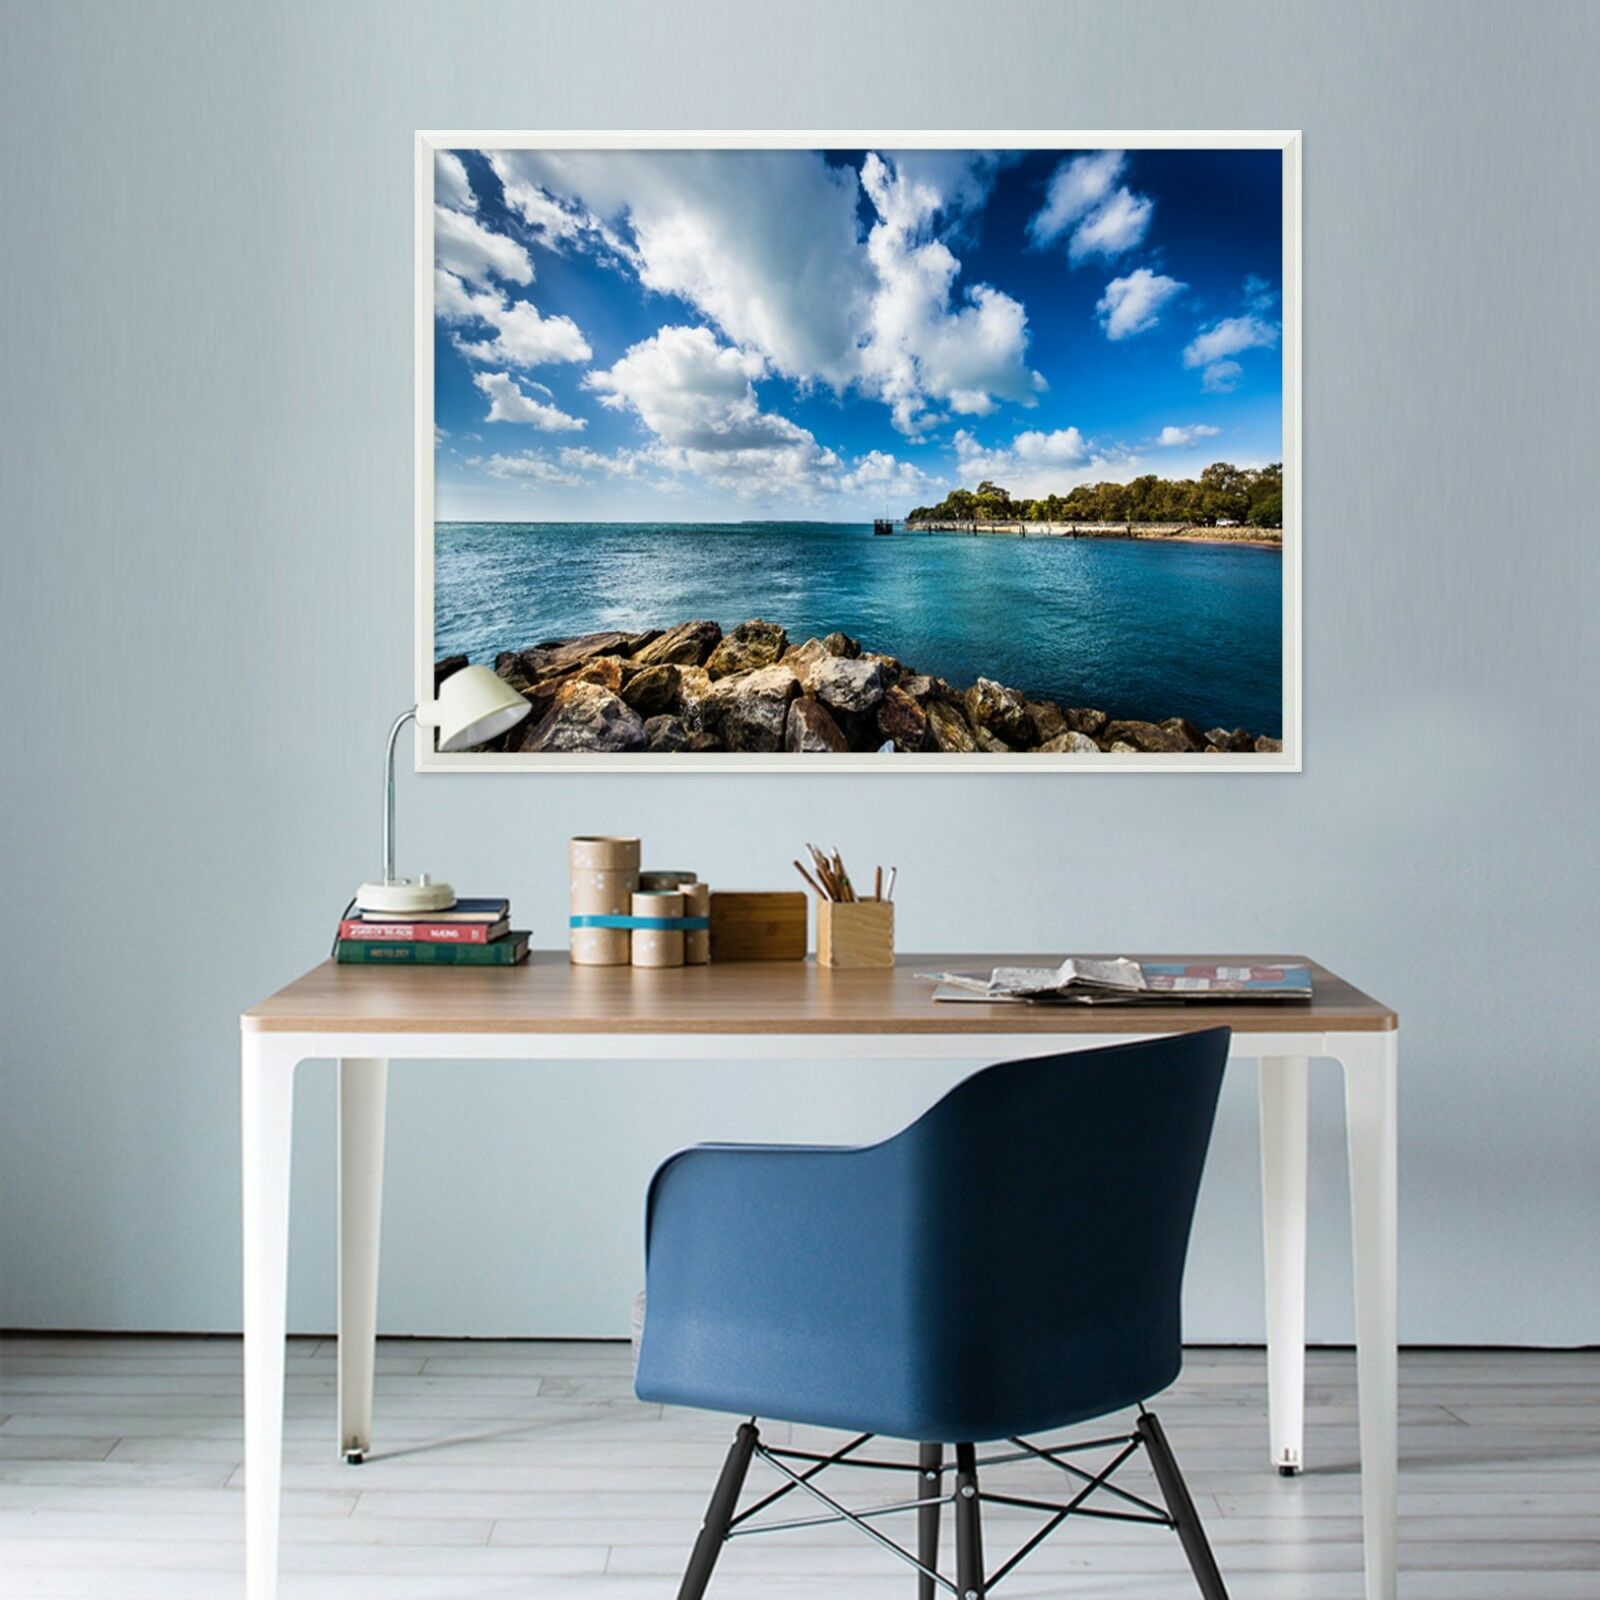 3D Clouds Sea Beach 2 Framed Poster Home Decor Print Painting Art AJ WALLPAPER